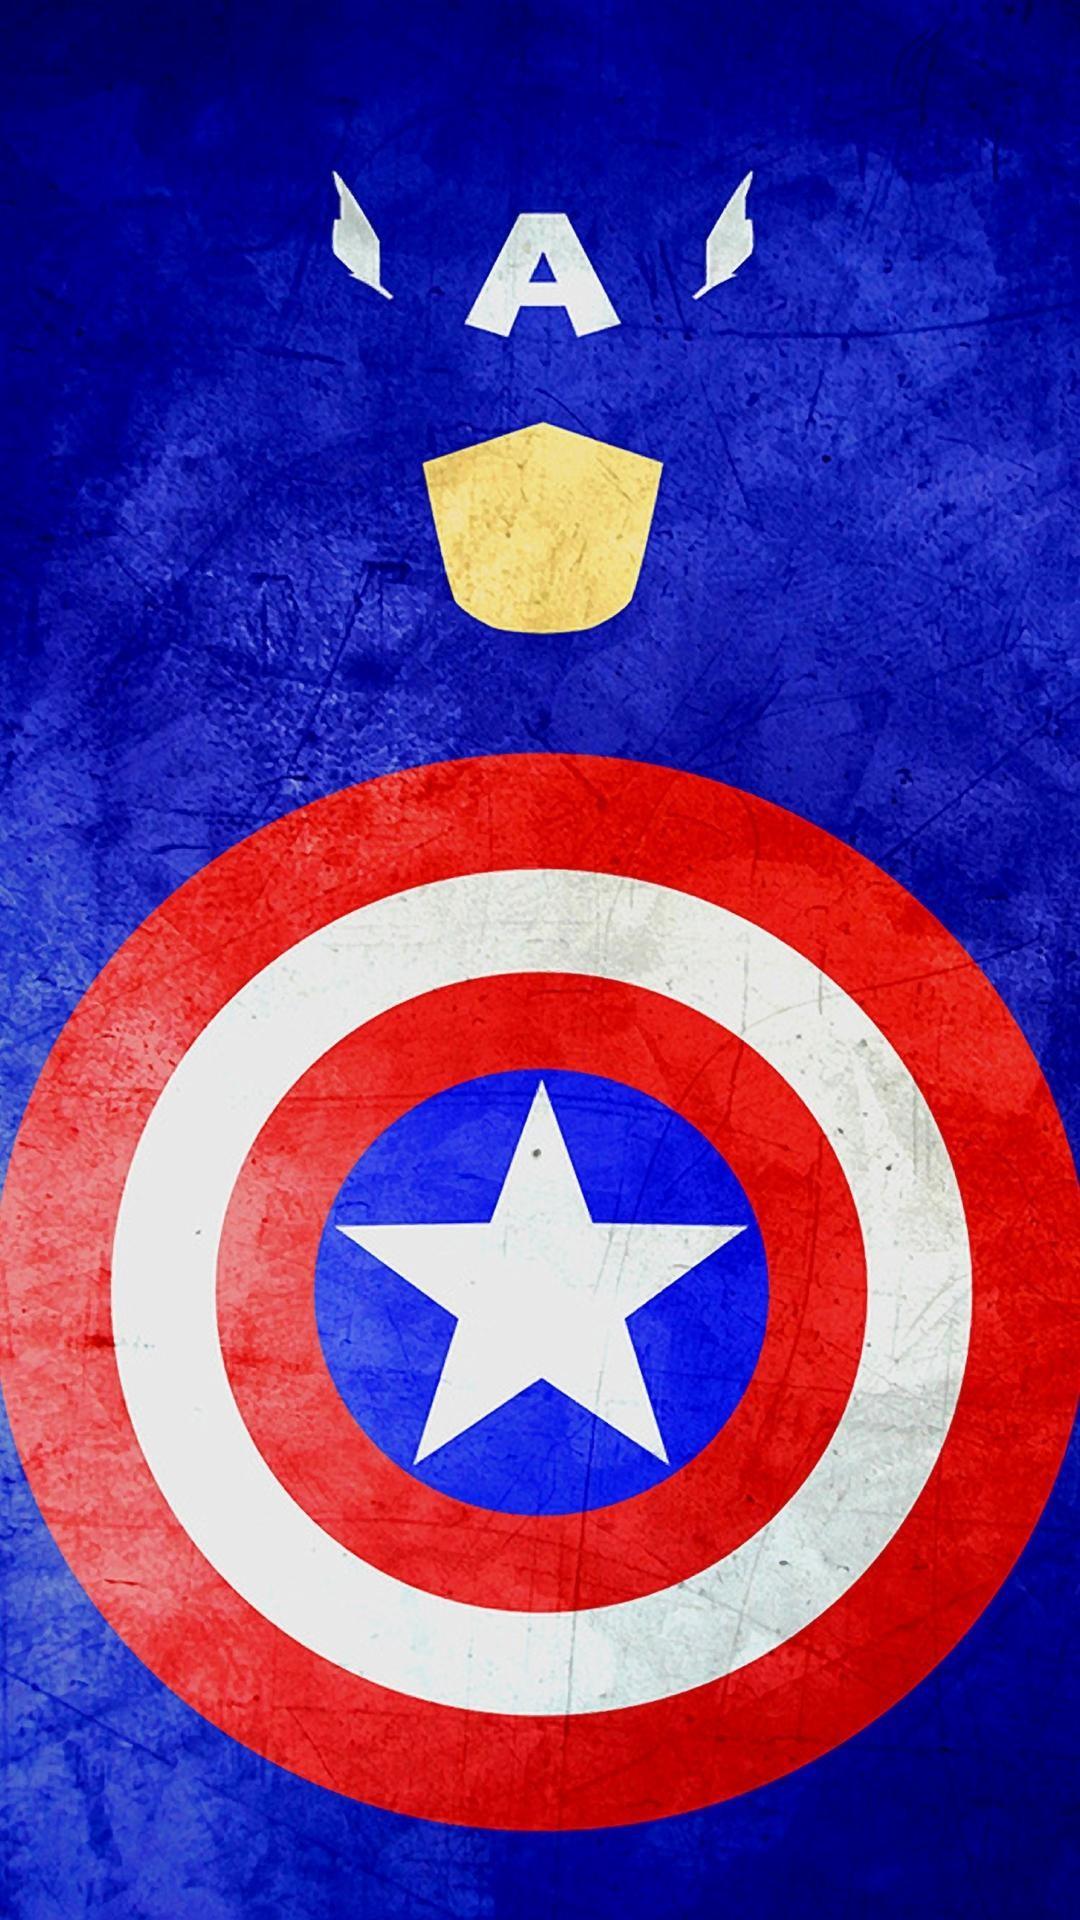 Captain-America-Minimal-Grunge.-1080%C3%971920-wallpaper